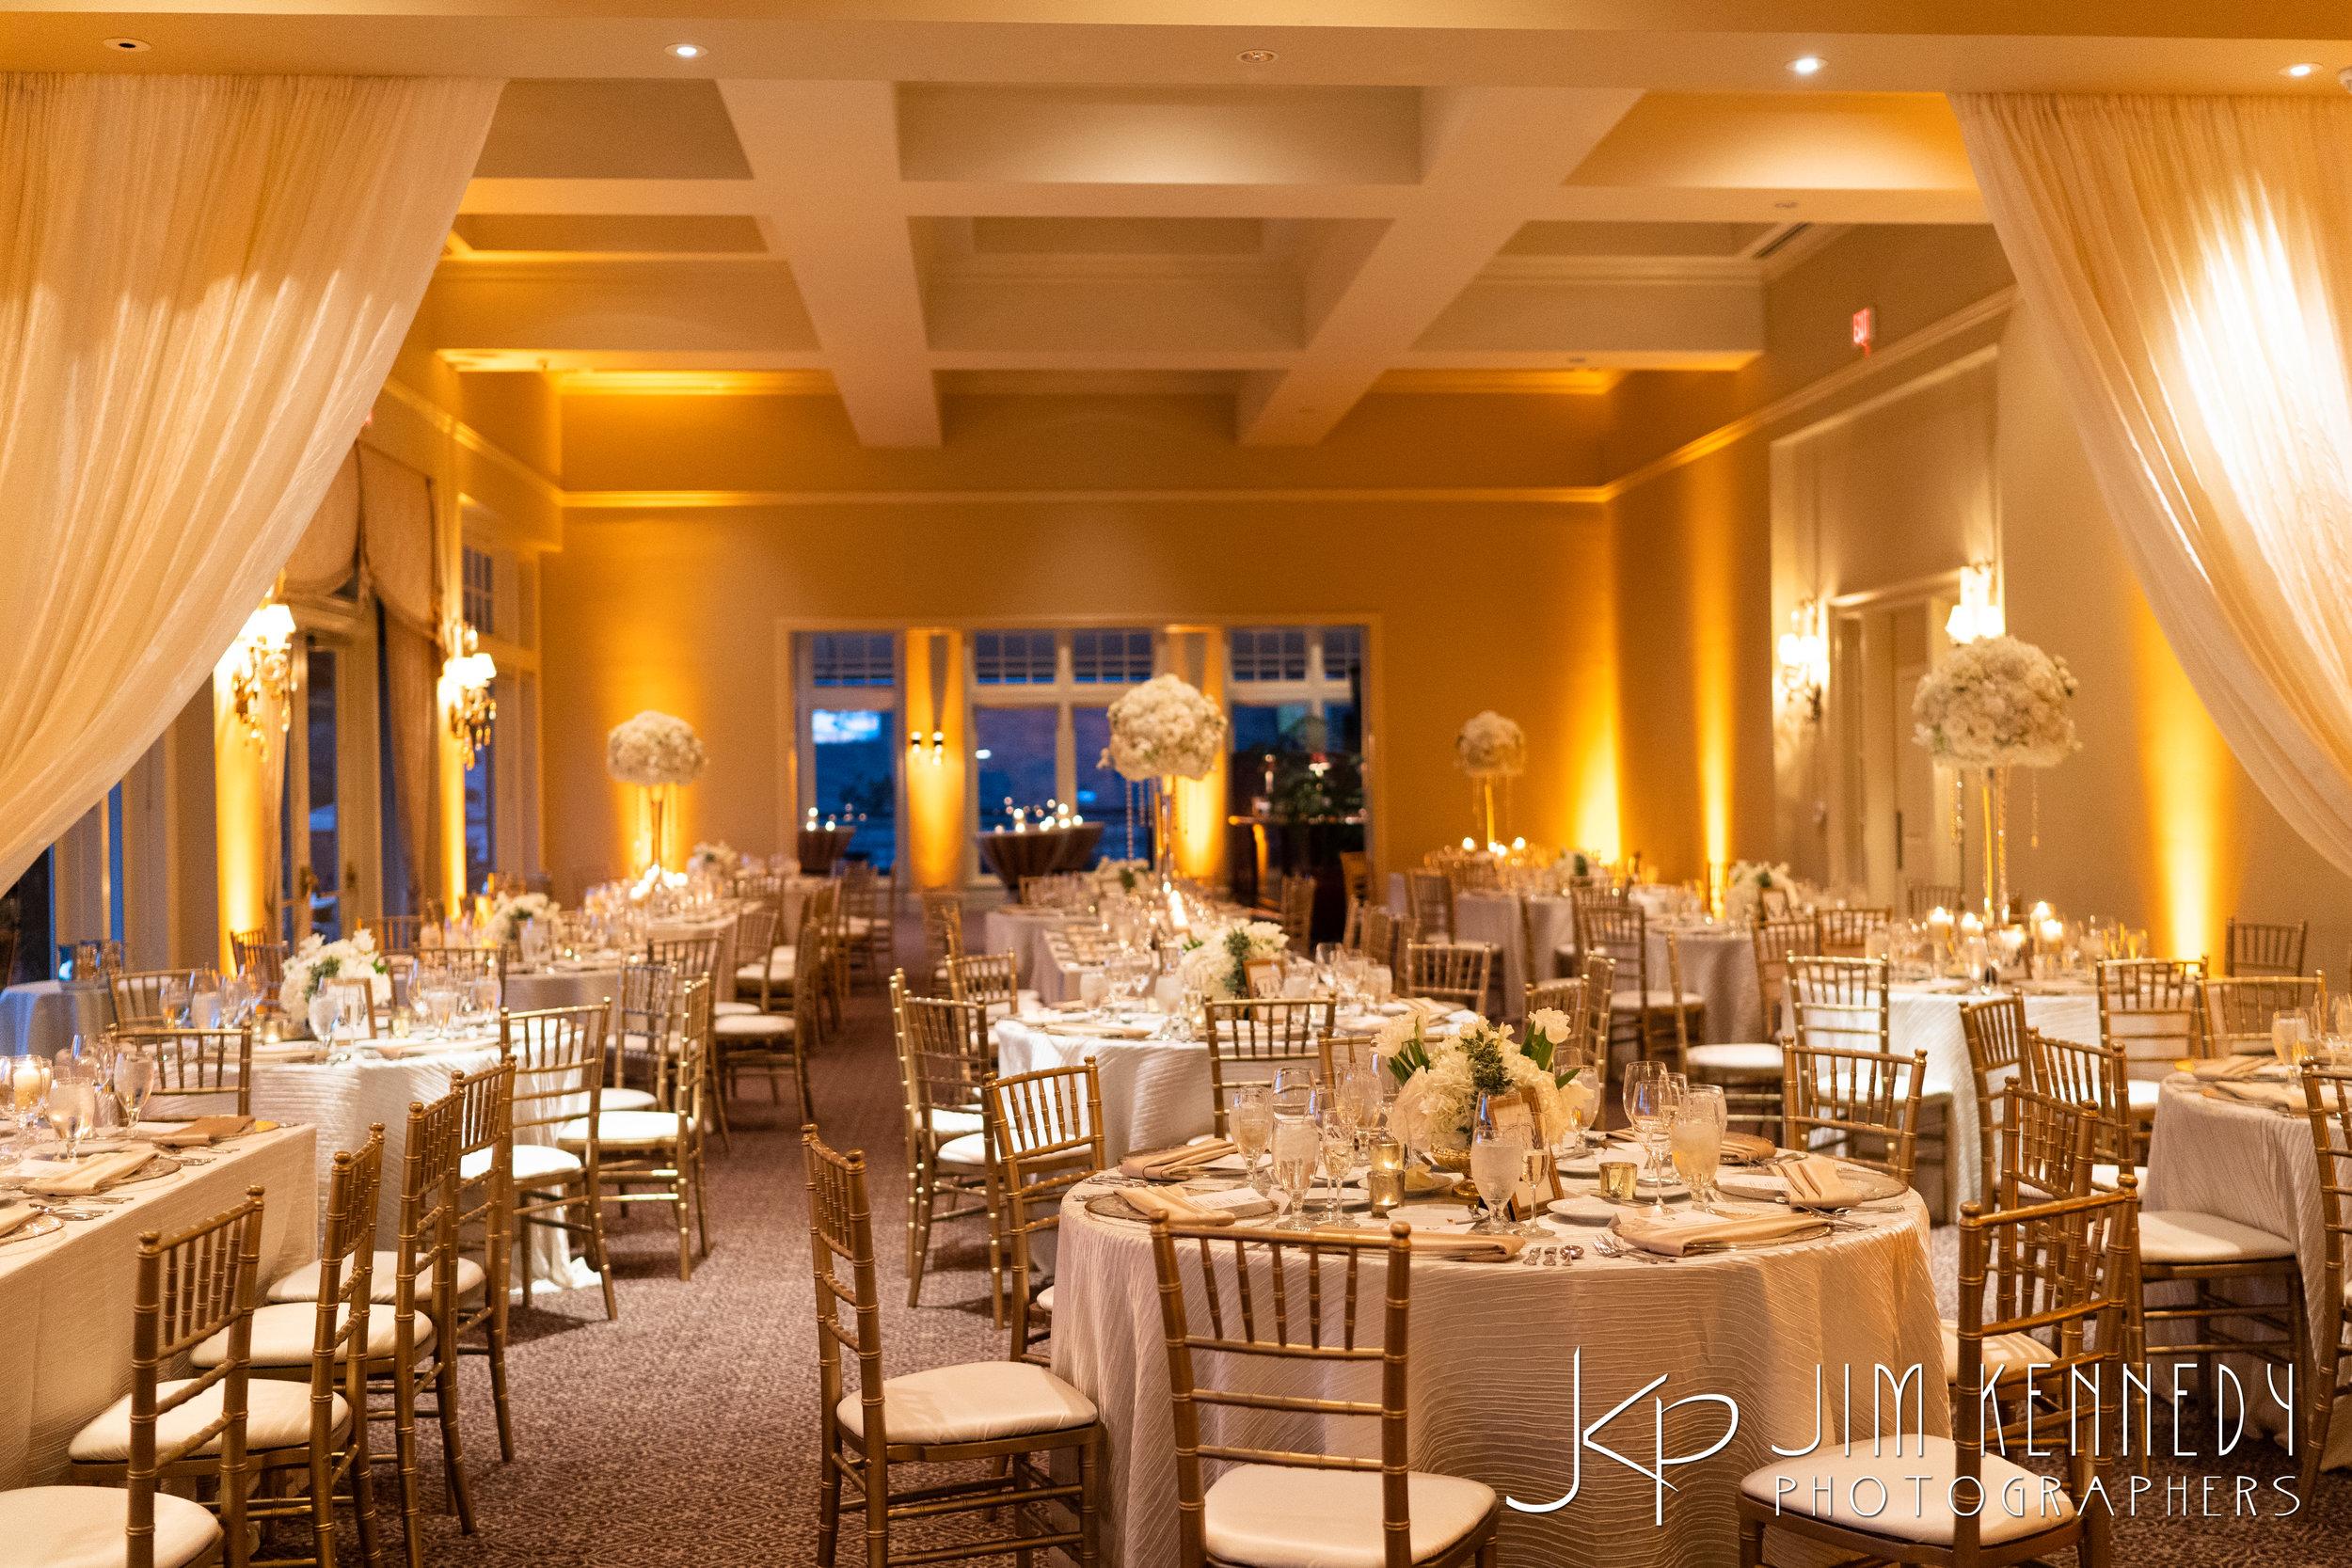 sherwood_country_club_wedding-2860.jpg